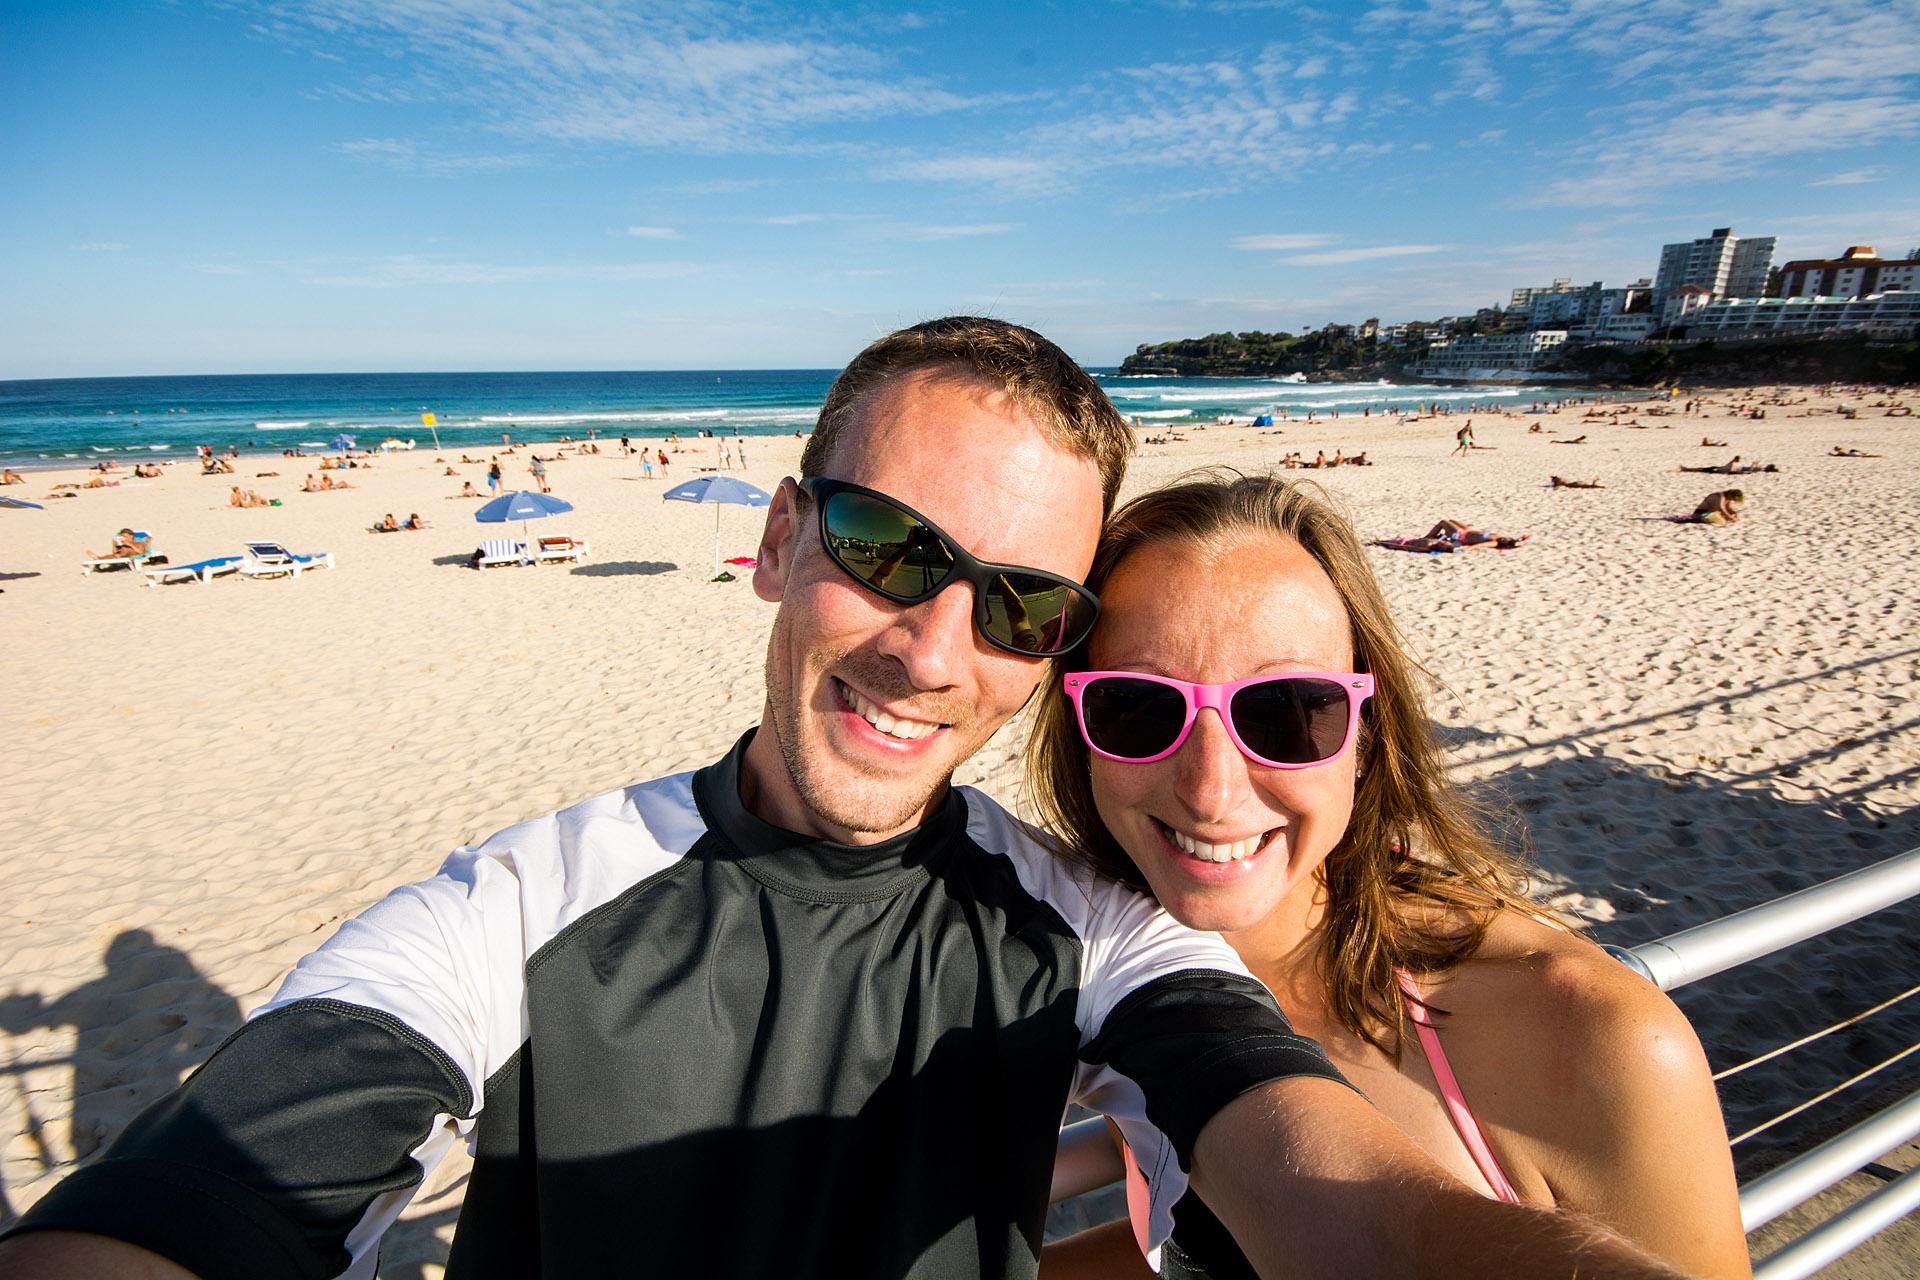 Post-surf lesson selfie at Bondi